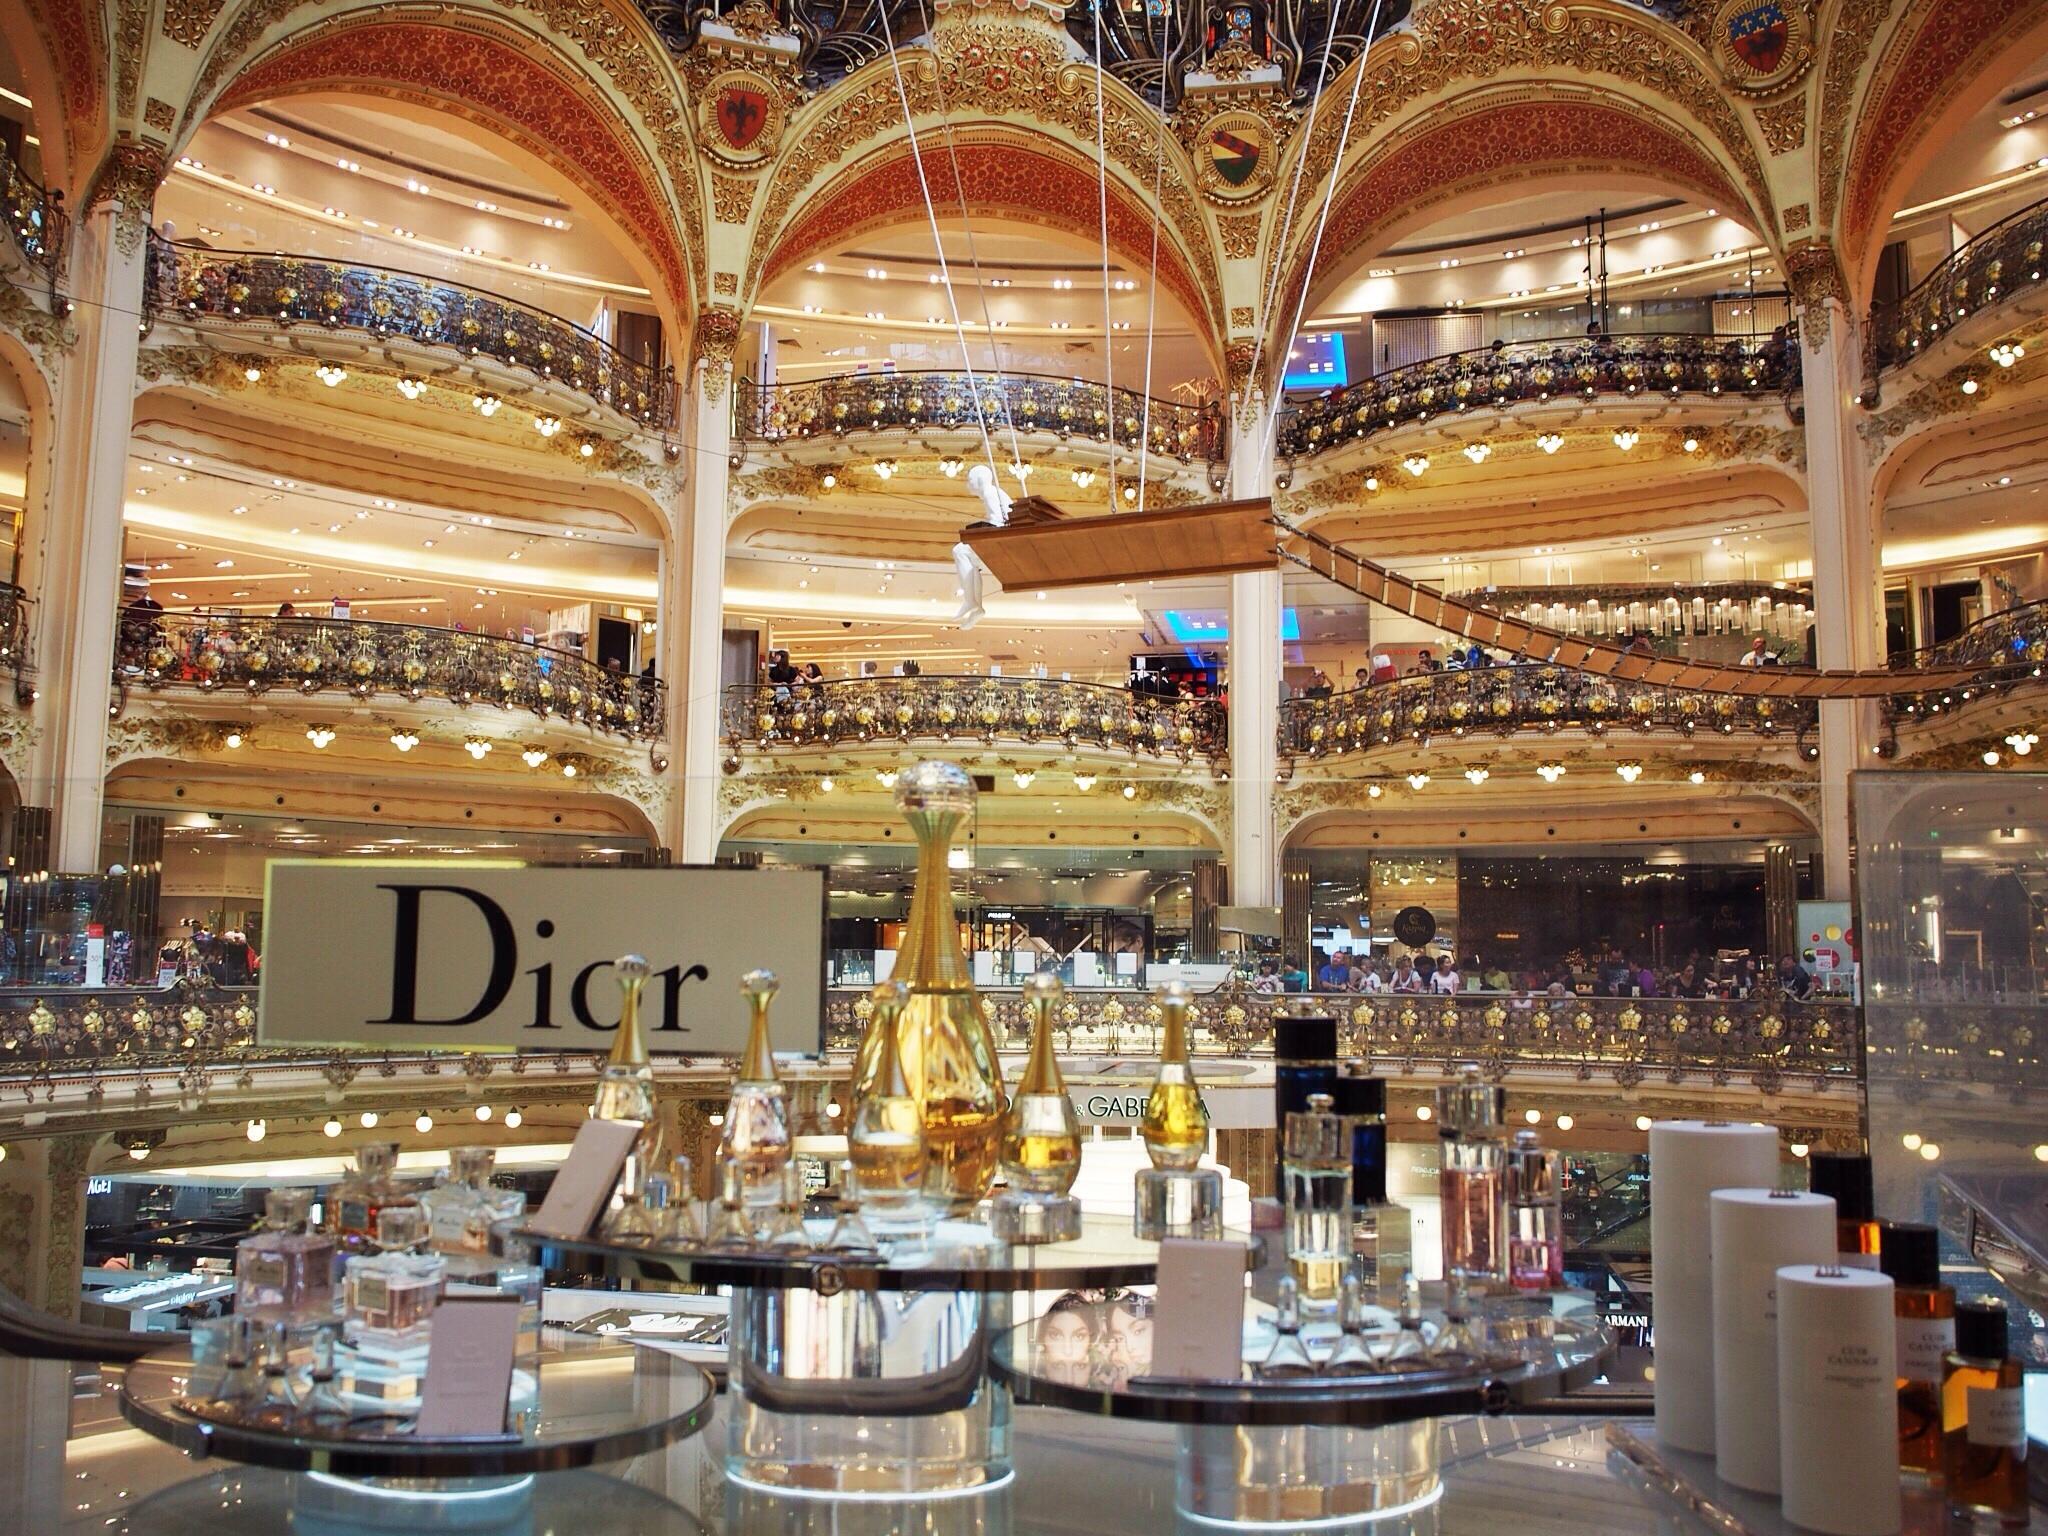 Galeries Lafayette, ten floors of Mecca shopping.